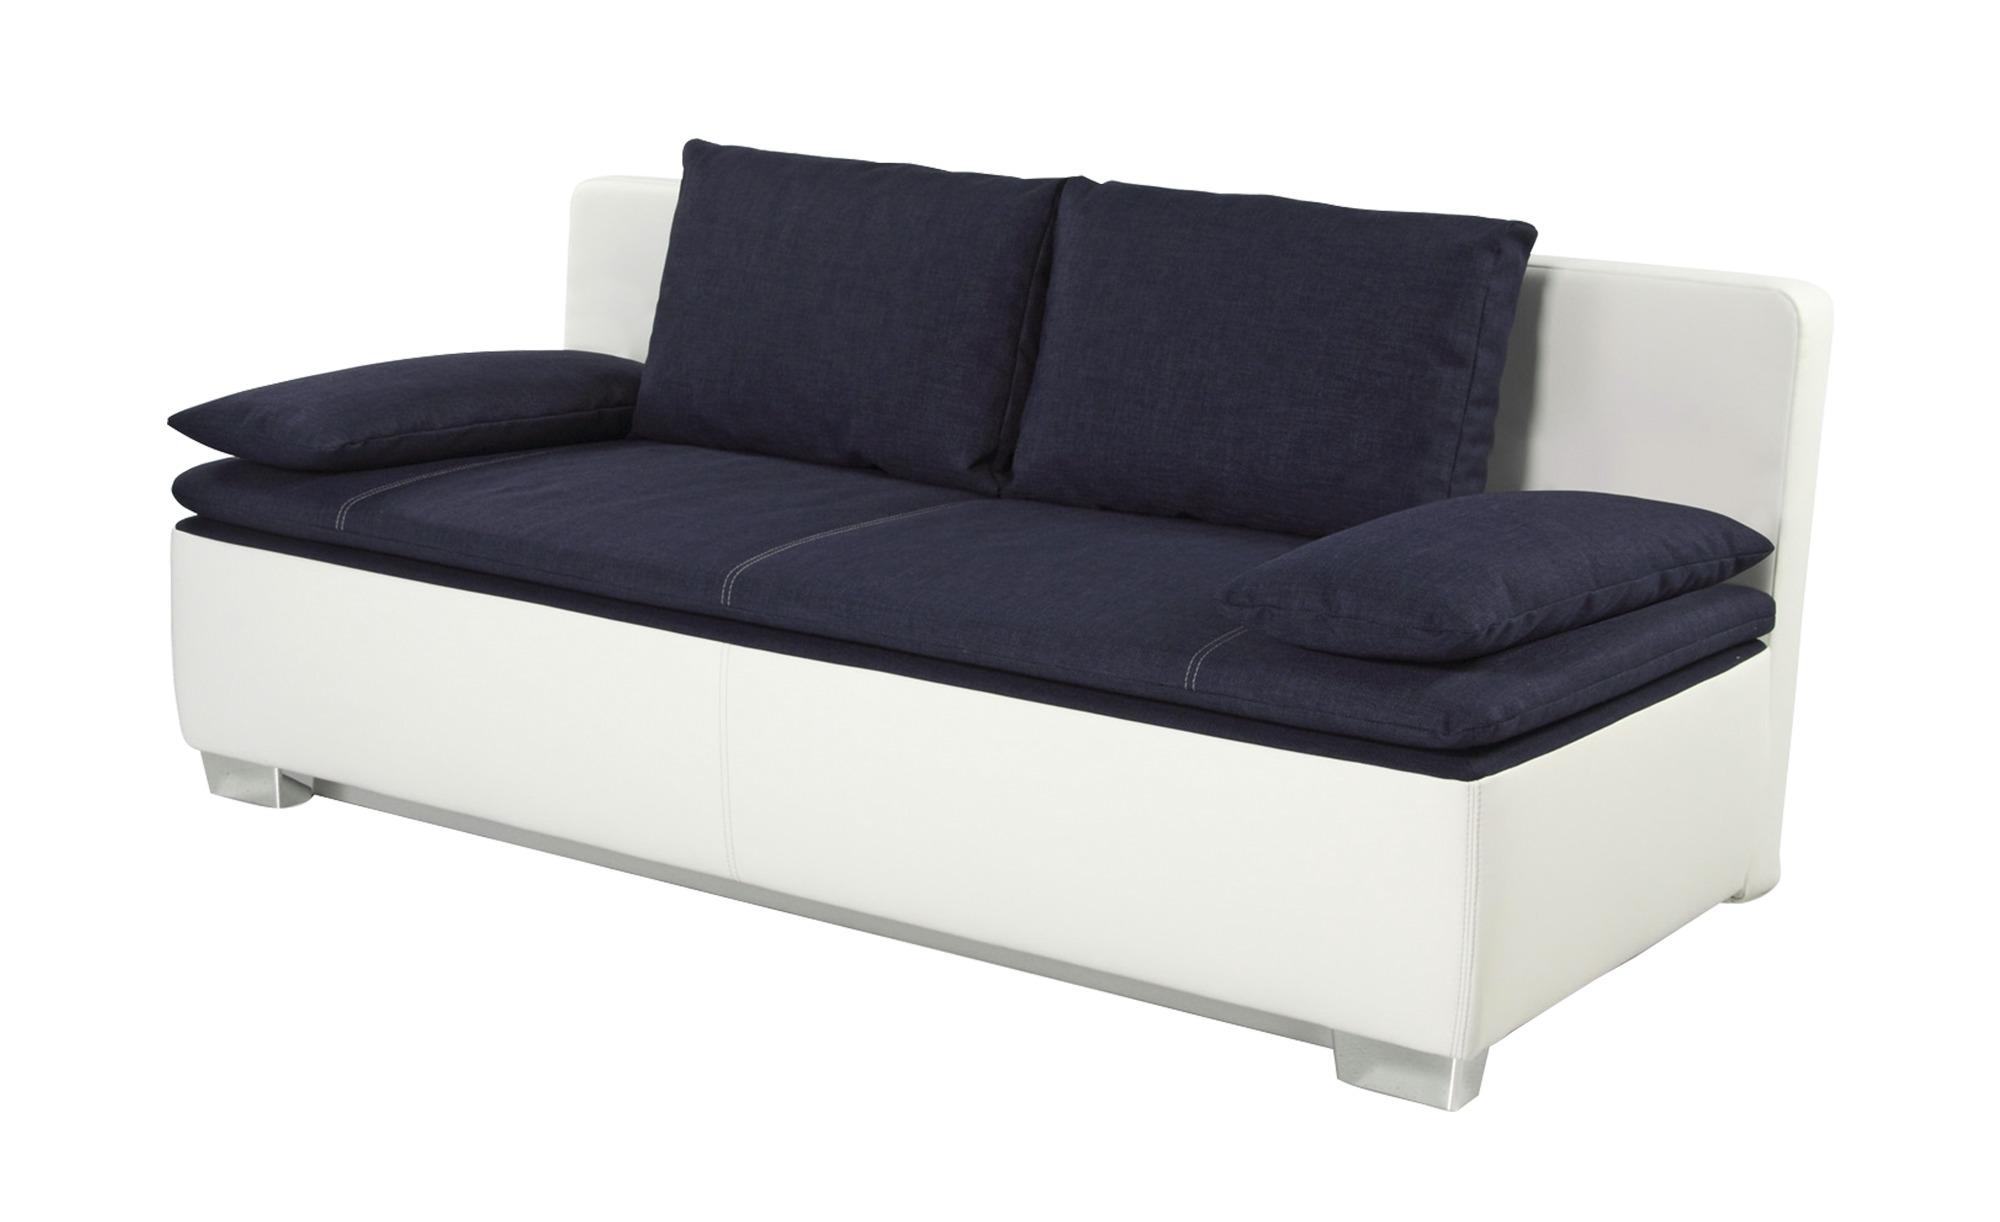 Schlafsofa weiß/blau - Kunstleder/Webstoff Ronja ¦ Maße (cm): B: 202 H: 85 T: 96 Polstermöbel > Sofas > 2-Sitzer - Höffner